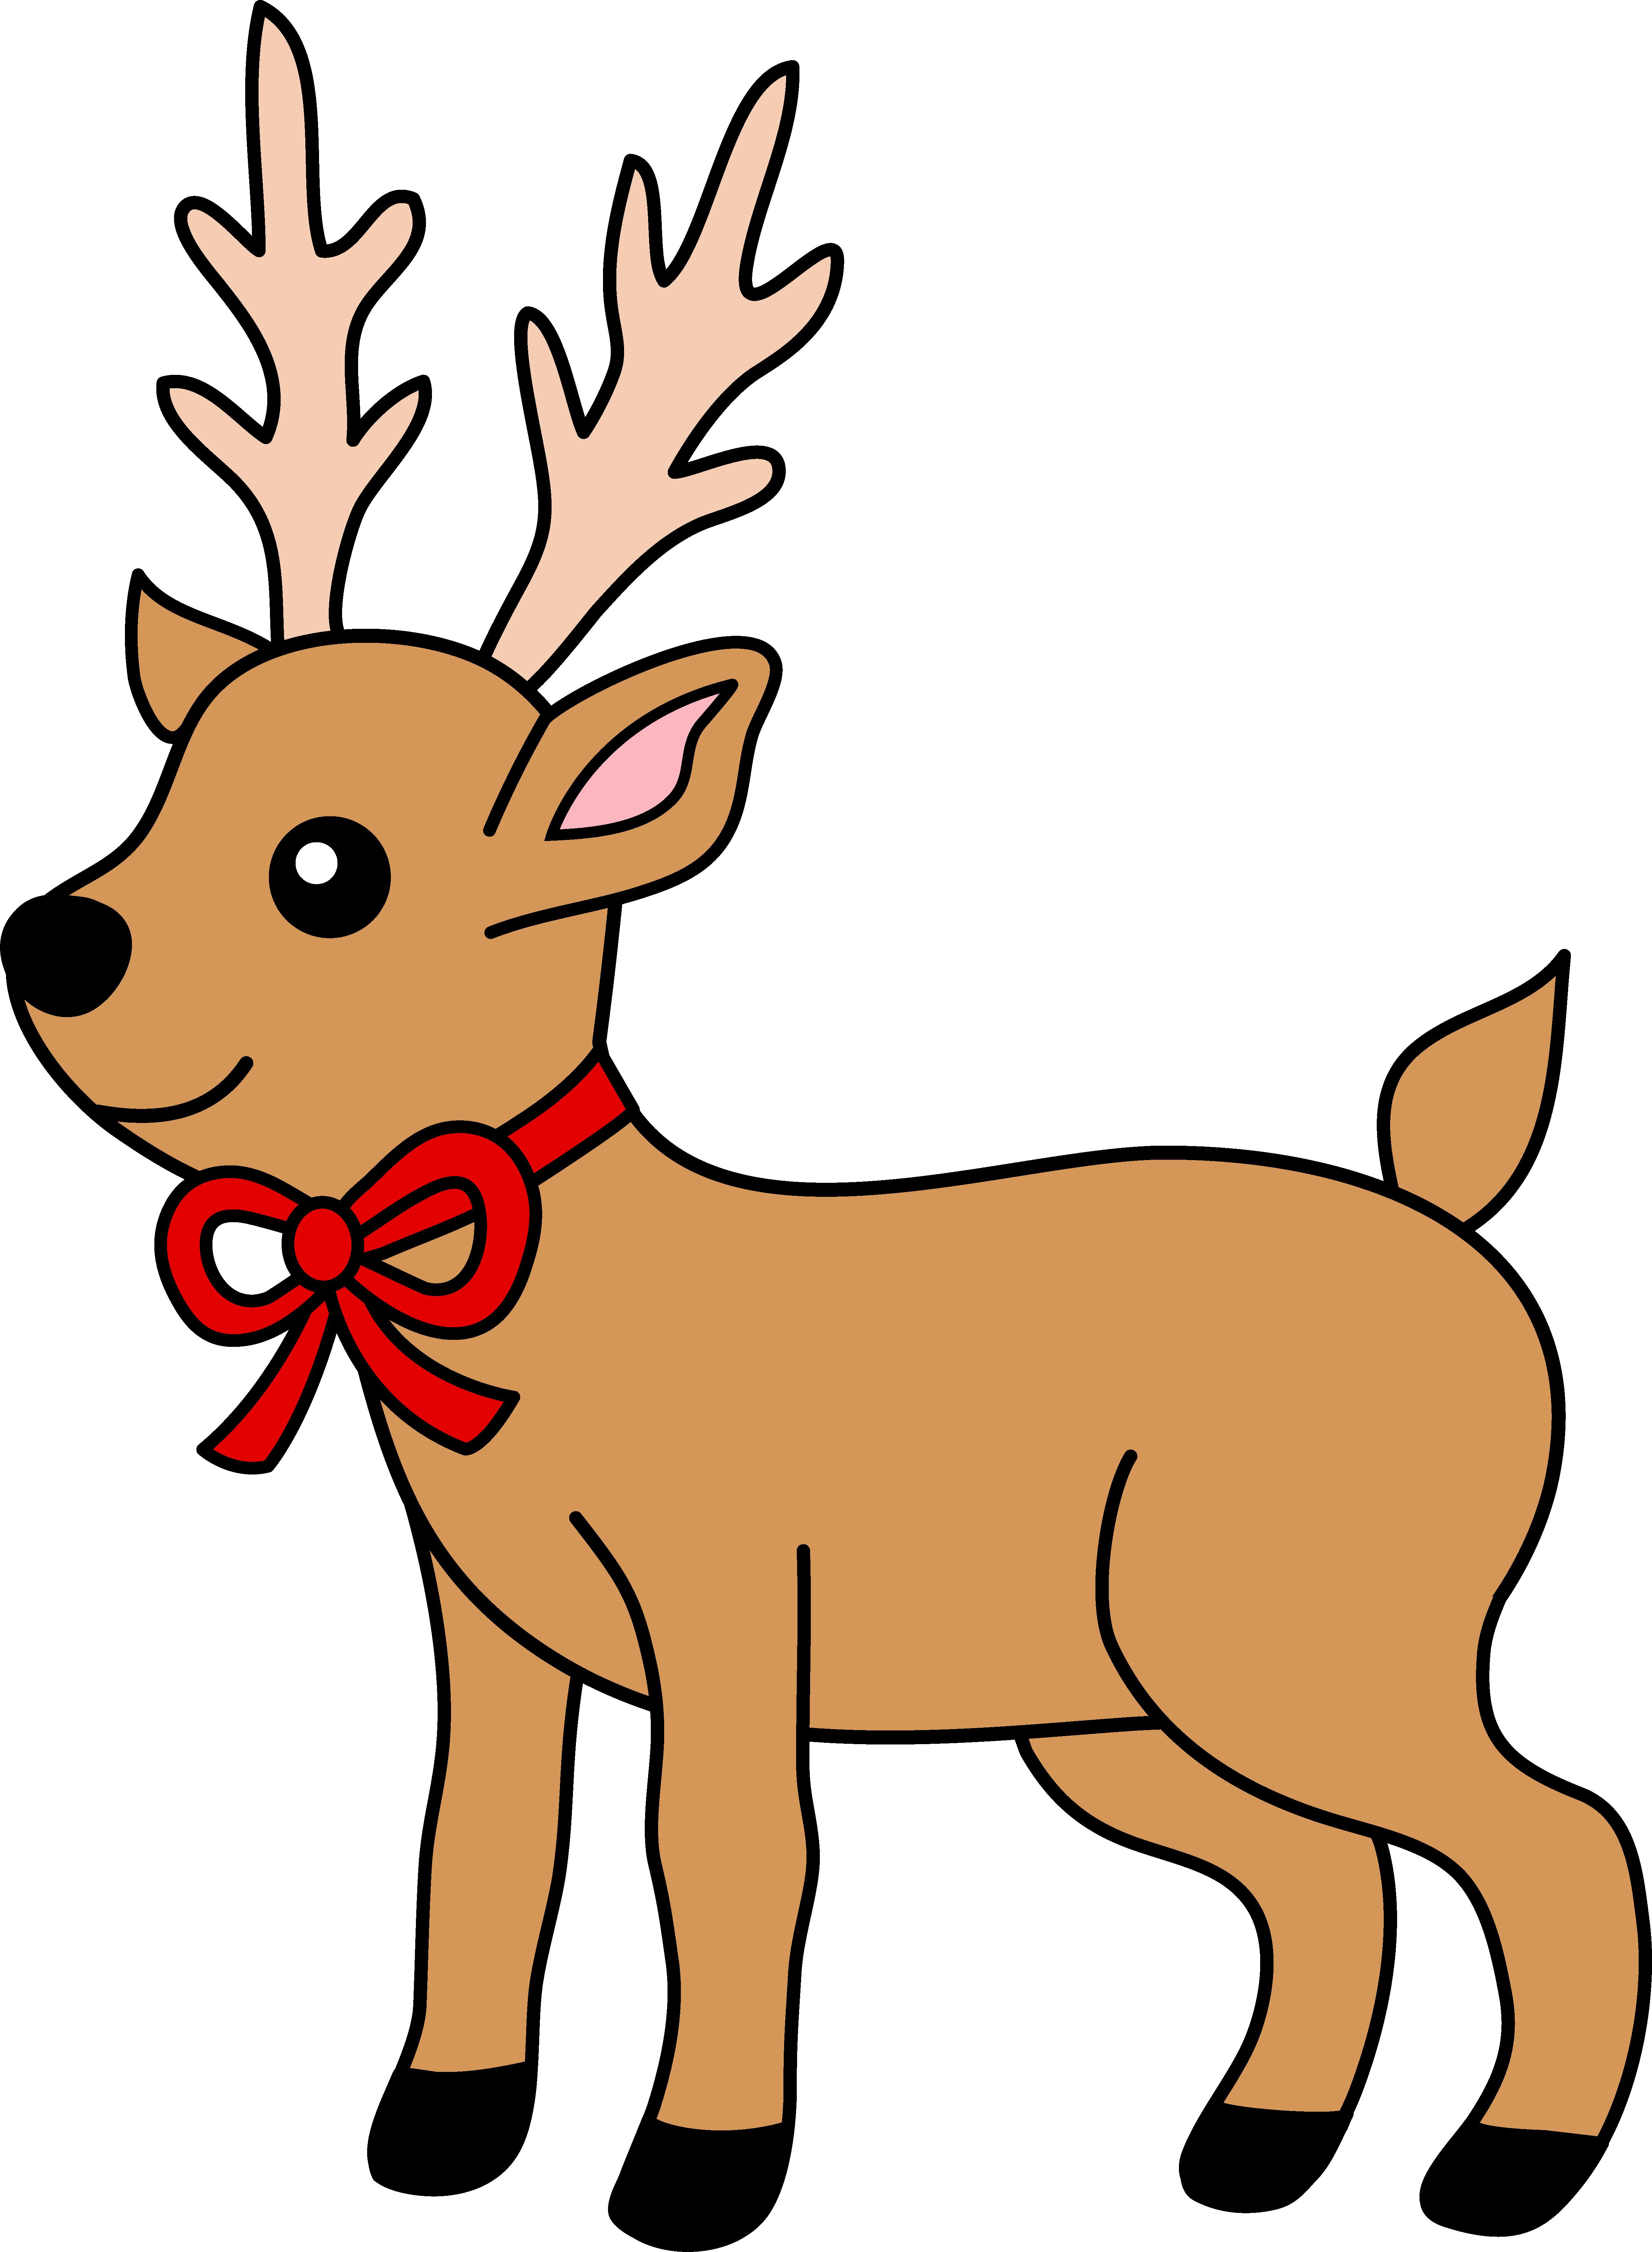 Reindeer clip art pictures picture Clip Art Reindeer & Clip Art Reindeer Clip Art Images - ClipartALL.com picture